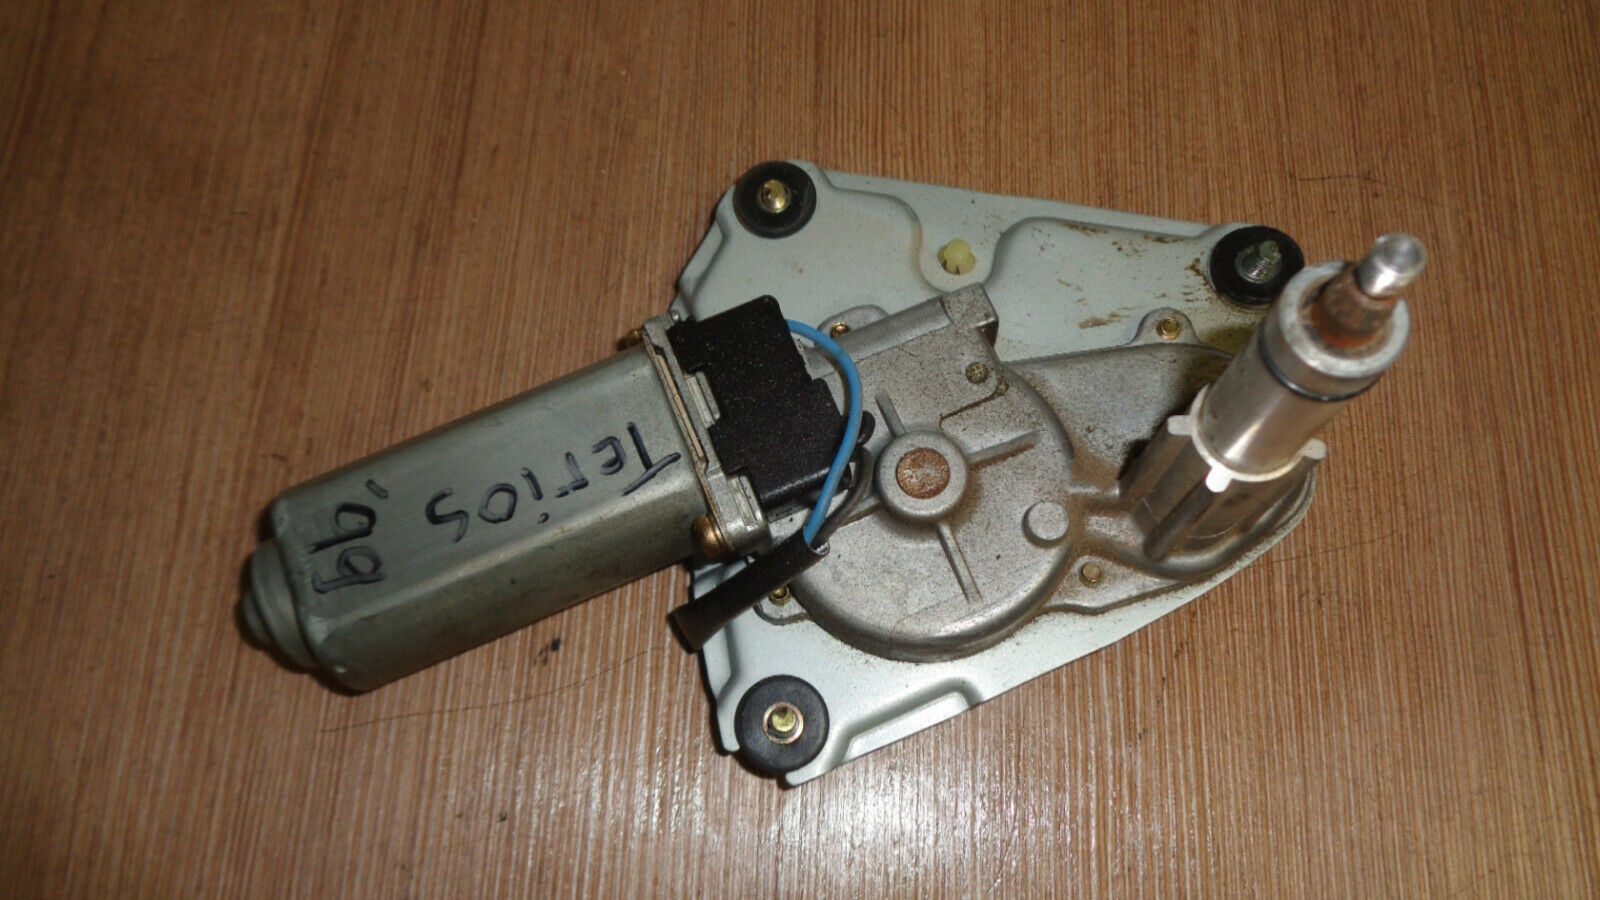 Engine Motor Mount Front R For 97-06 Daihatsu Terios 99-05 Toyota Camil MK158